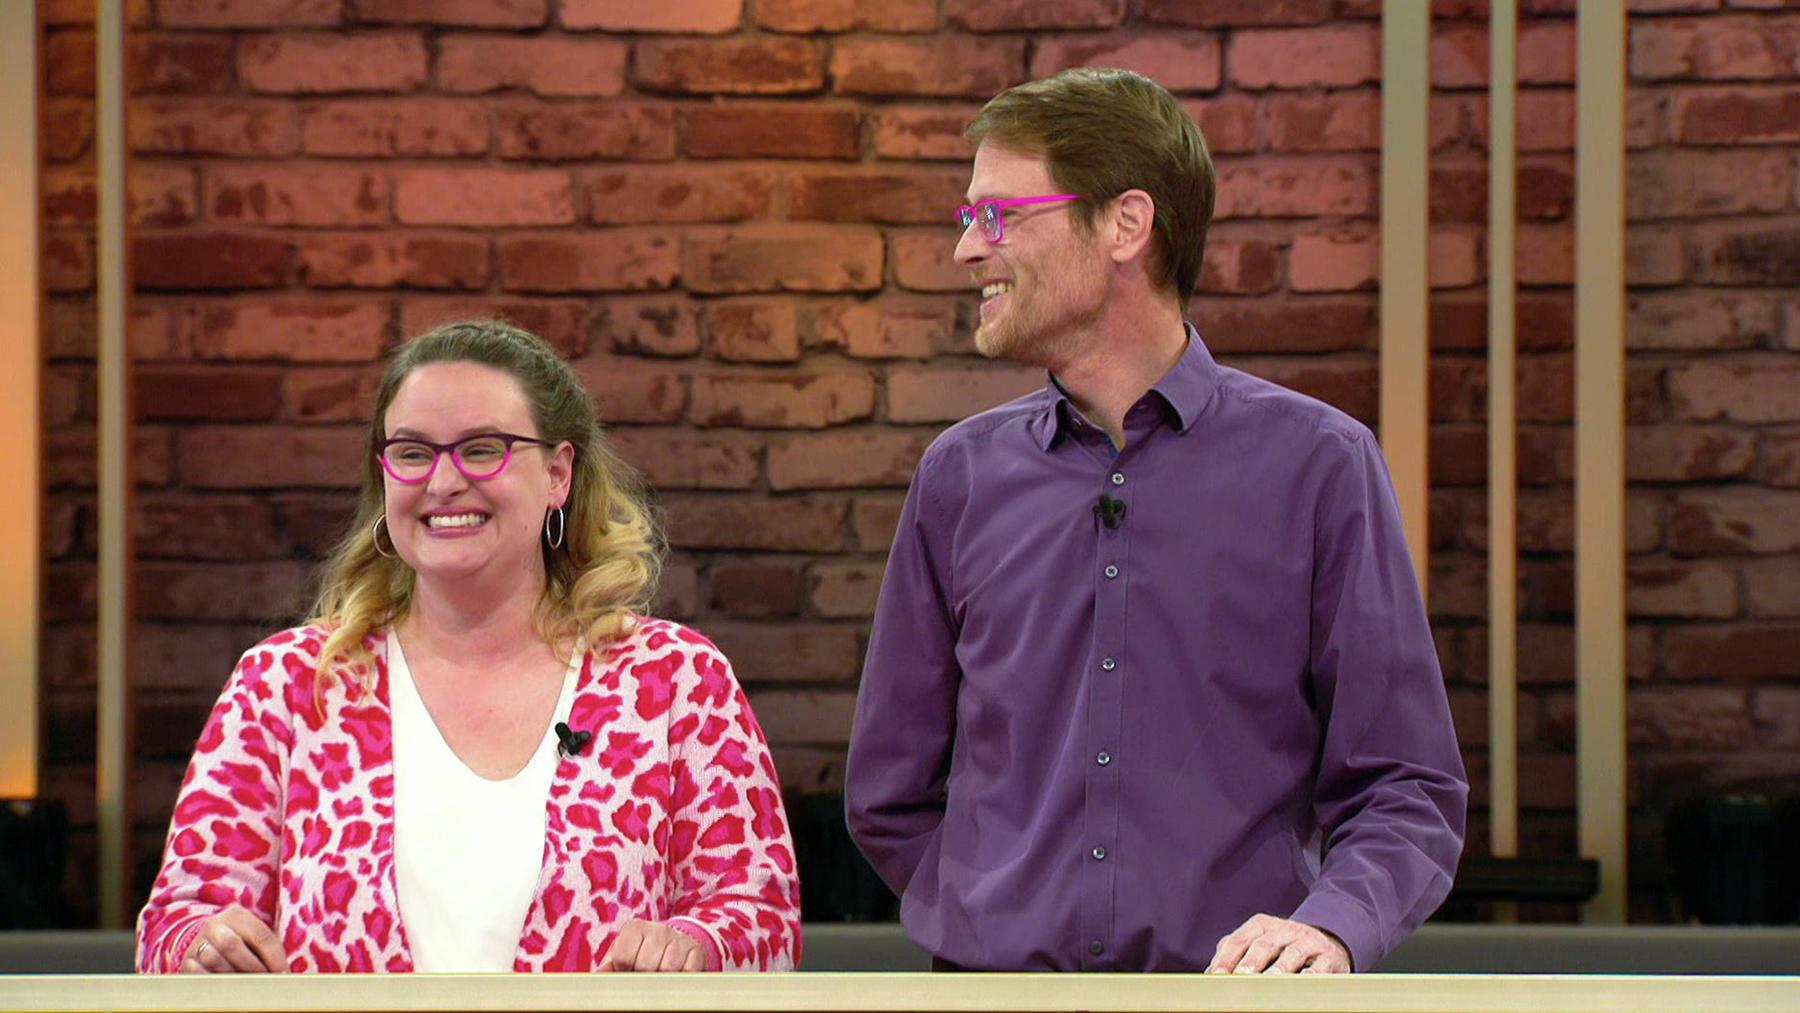 Sammler-Spezial - Kandidatenpaar Nadine & Ralf / Experte Mauro